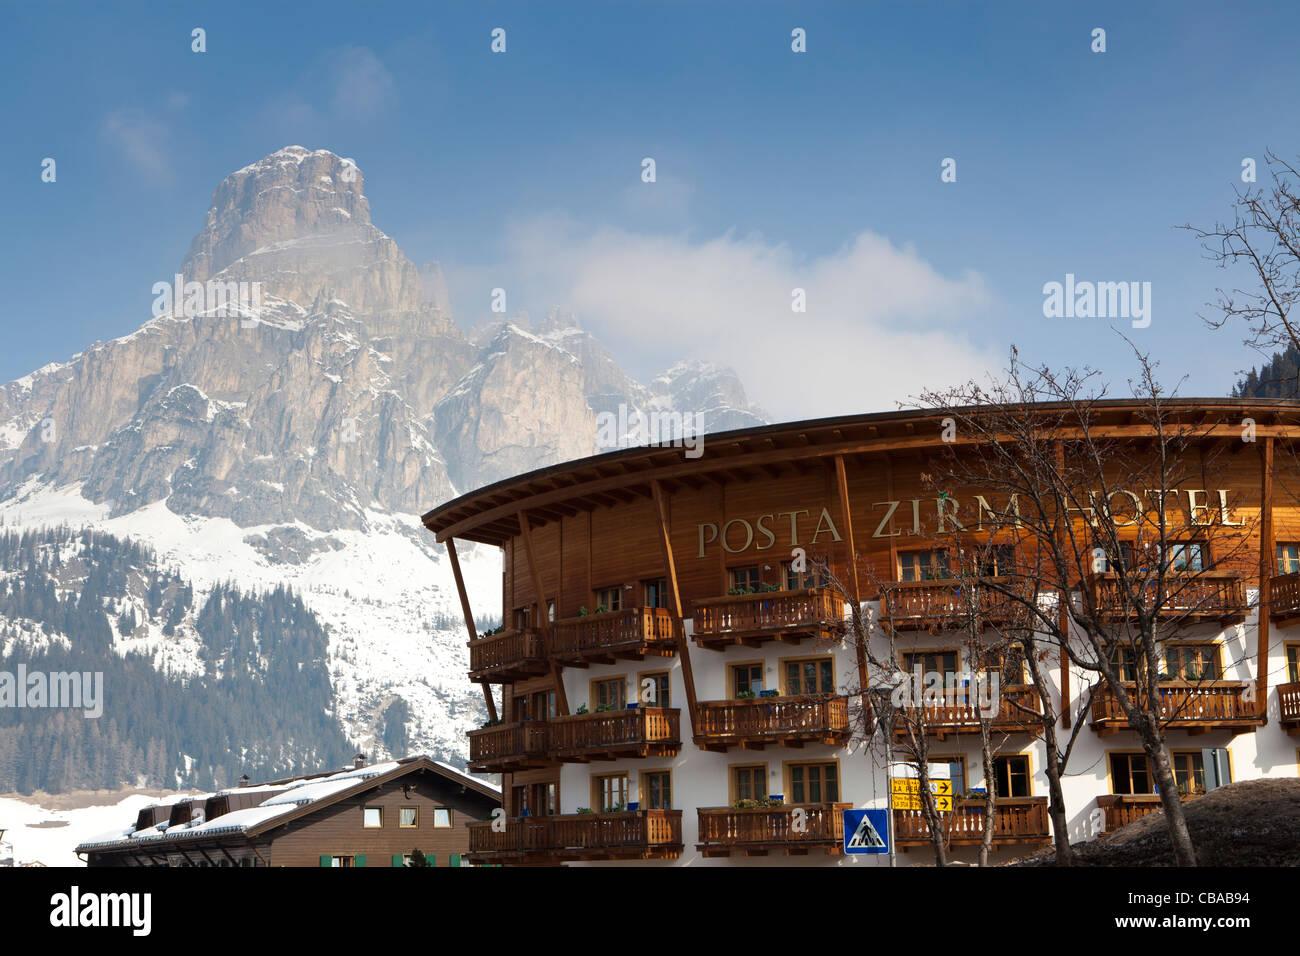 Posta Zirm Hotel in Corvara, Alta Badia, Alto Adige, Italy - Stock Image